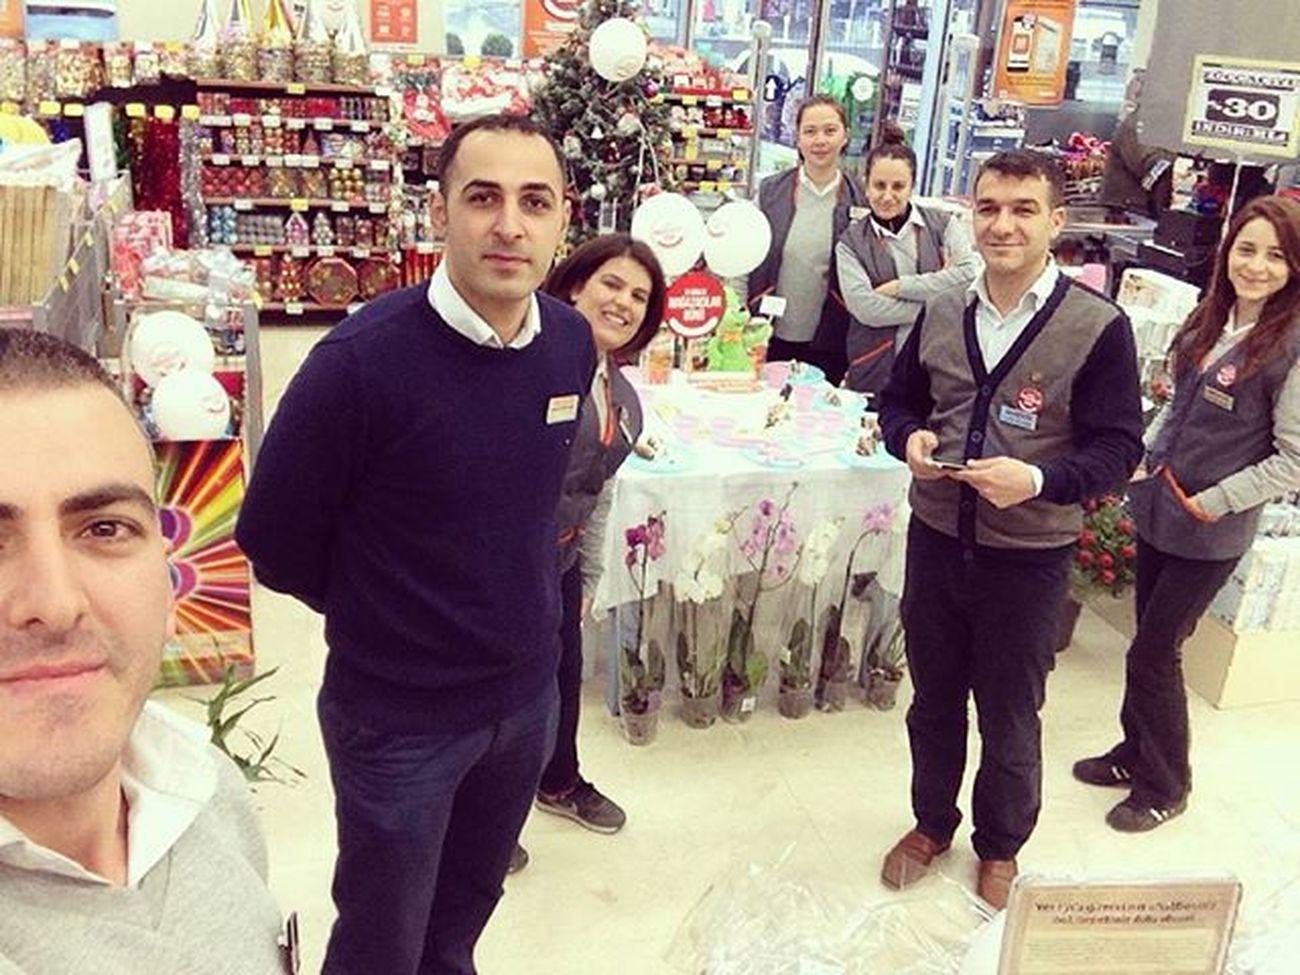 KırkpınarMMMigros 12.12.2015 mağazacılar günü Mağazacılargünü